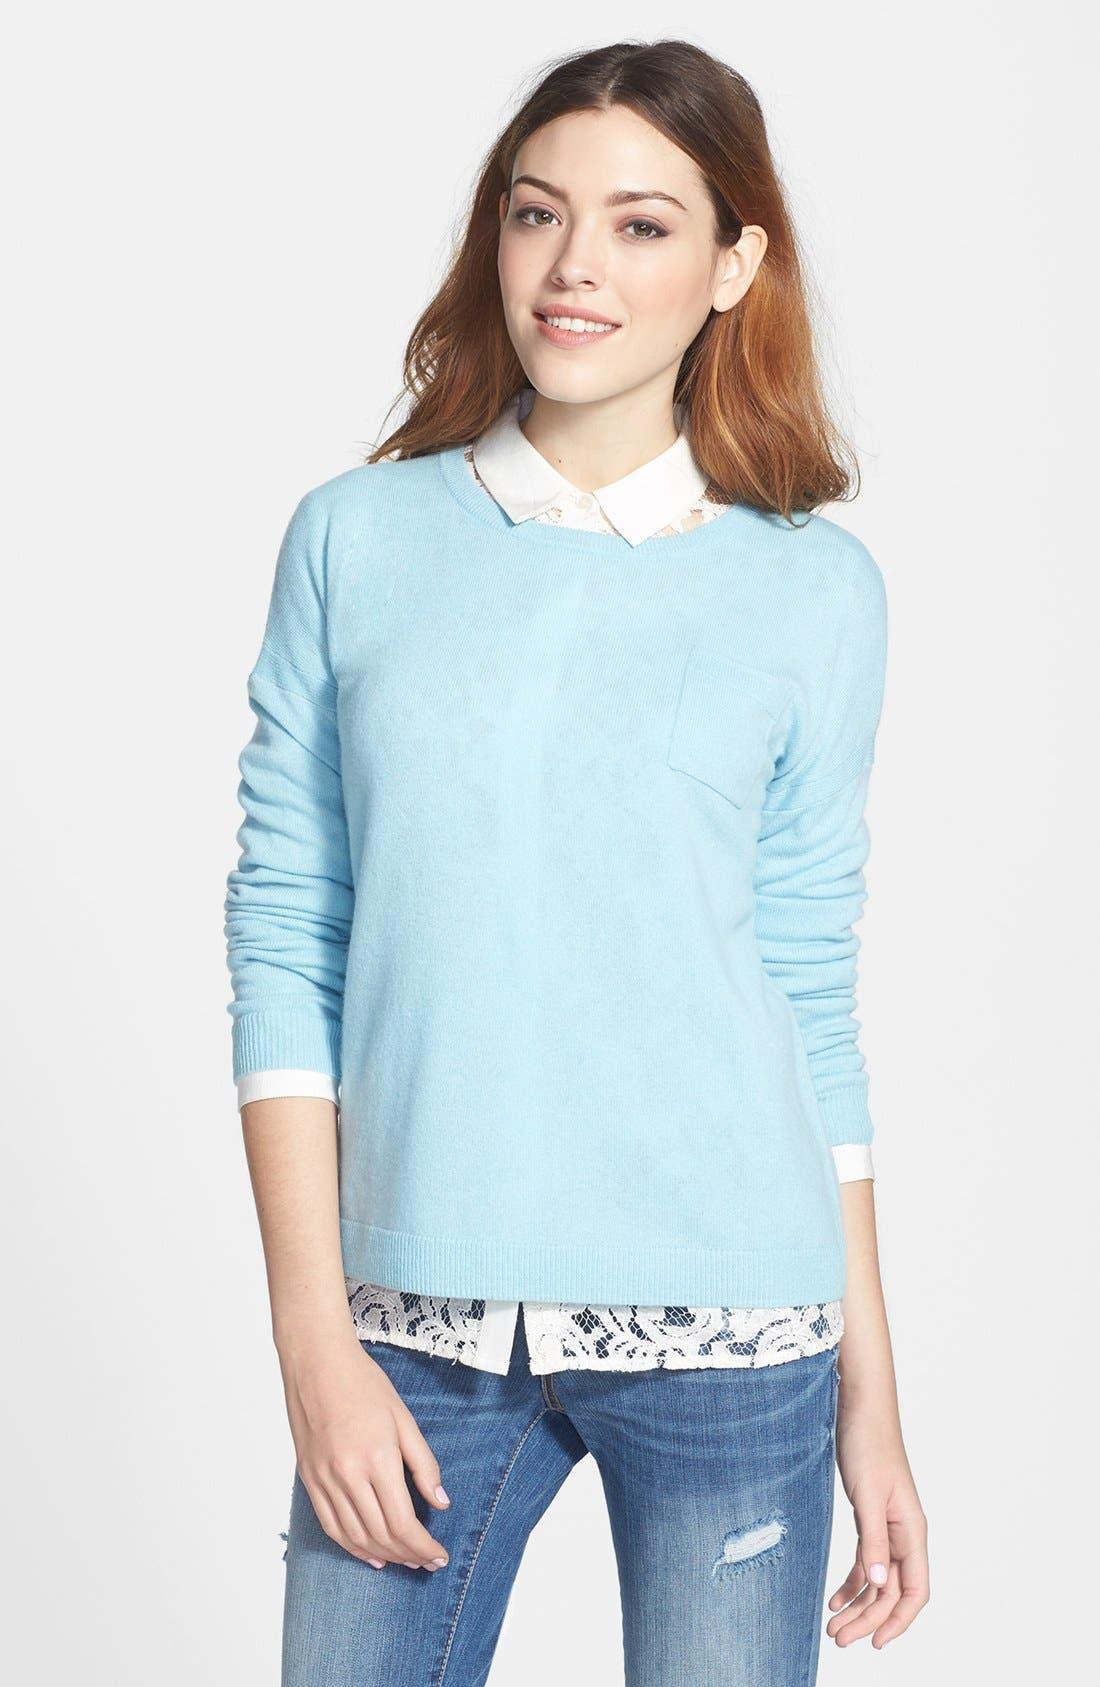 Main Image - Halogen® Lightweight Cashmere Crewneck Sweater with Pocket